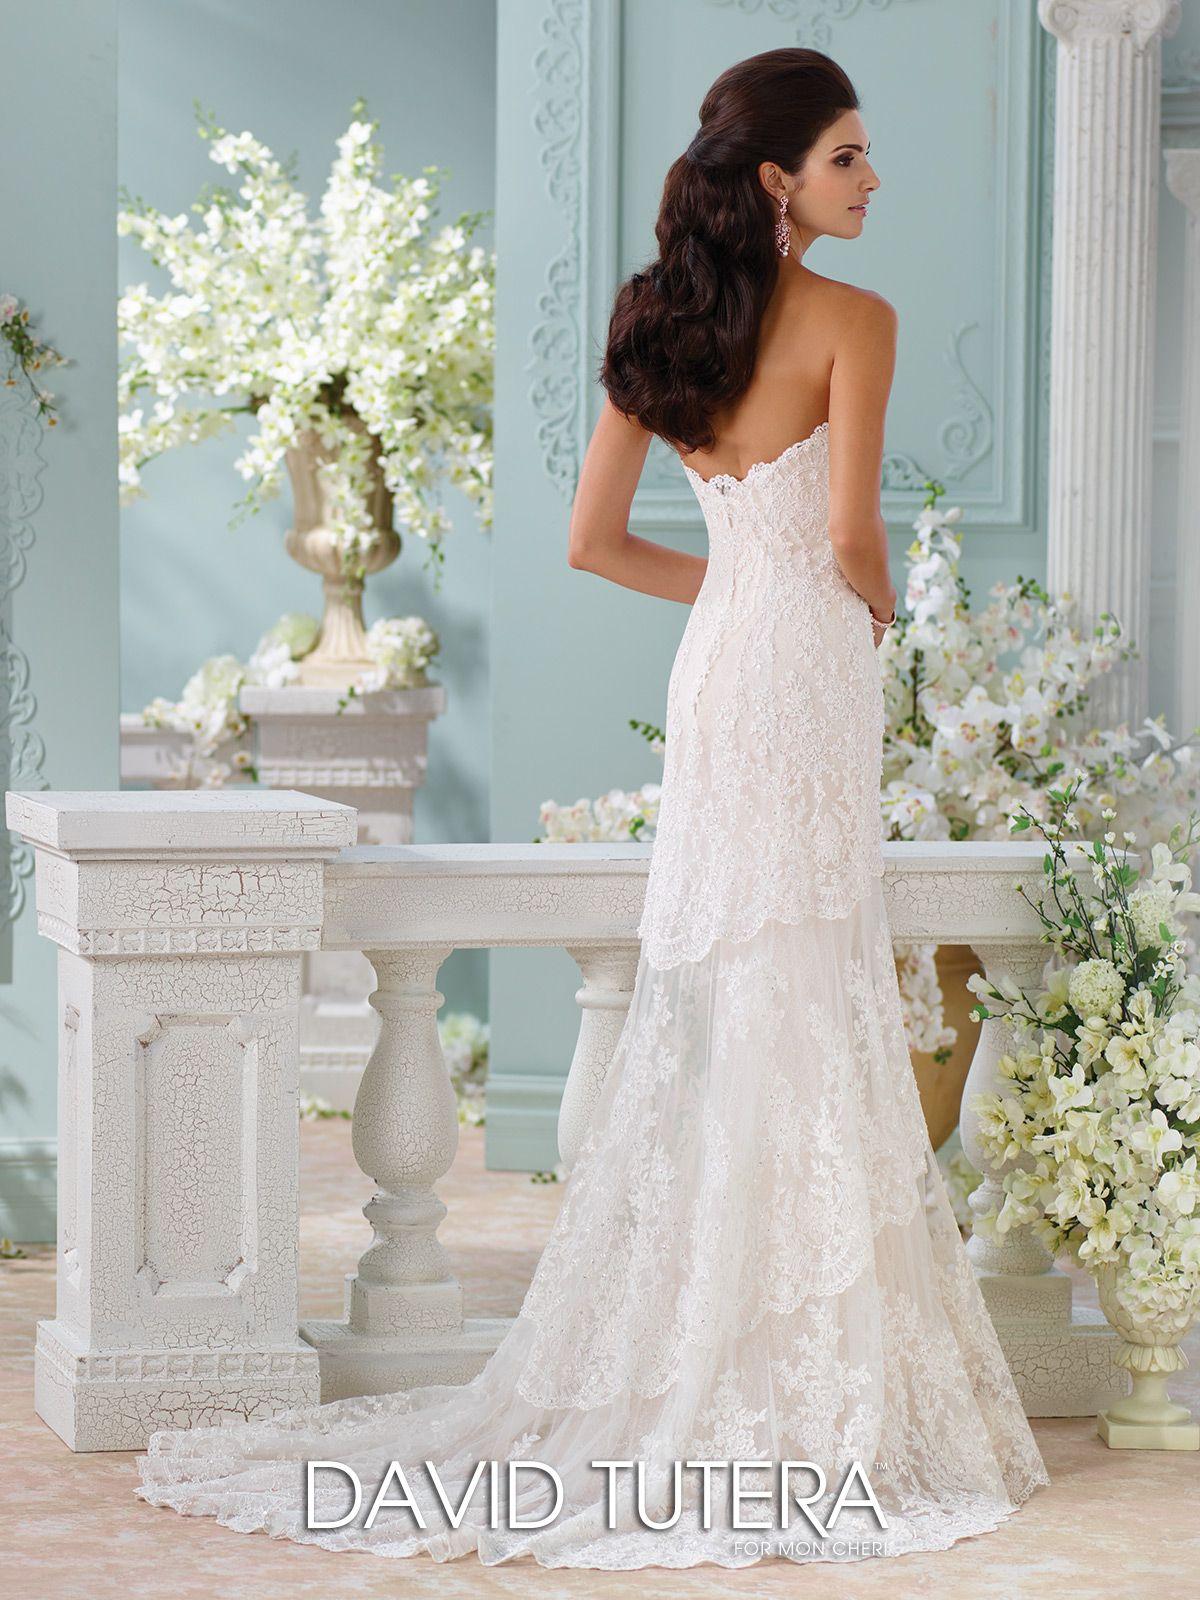 Unique Wedding Dresses Fall 2018 - Martin Thornburg | Wedding dress ...